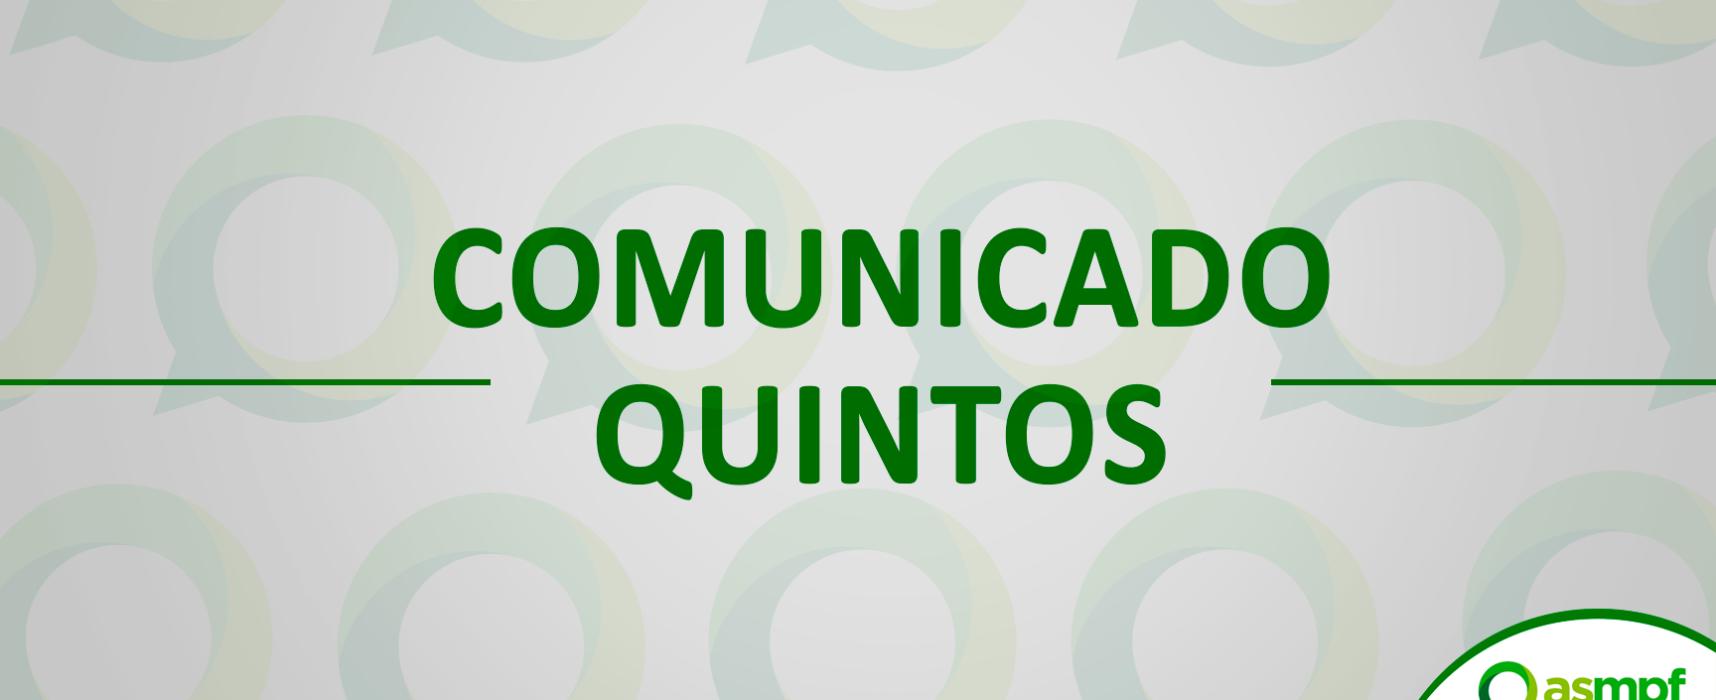 Quintos U2013 Asmpf Em Defesa Do Servidor, Opôs Embargos De Declaração   Asmpf Logo Png - Asmpf, Transparent background PNG HD thumbnail